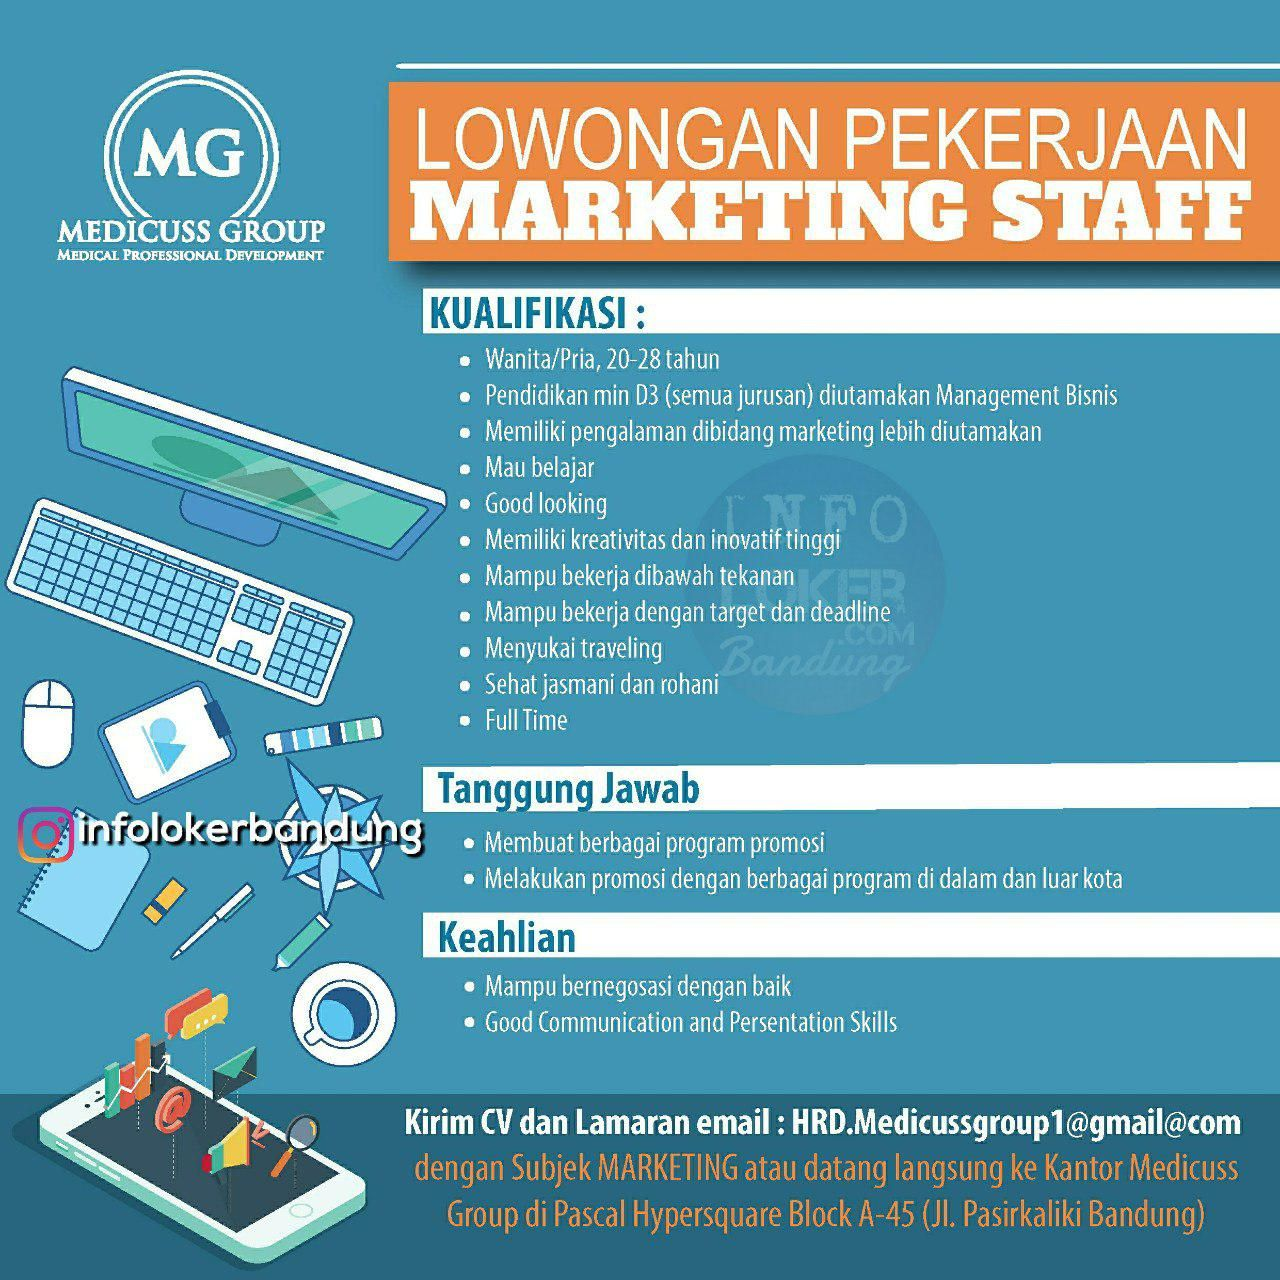 Lowongan Kerja Medicuss Group Bandung Oktober 2018 Marketing